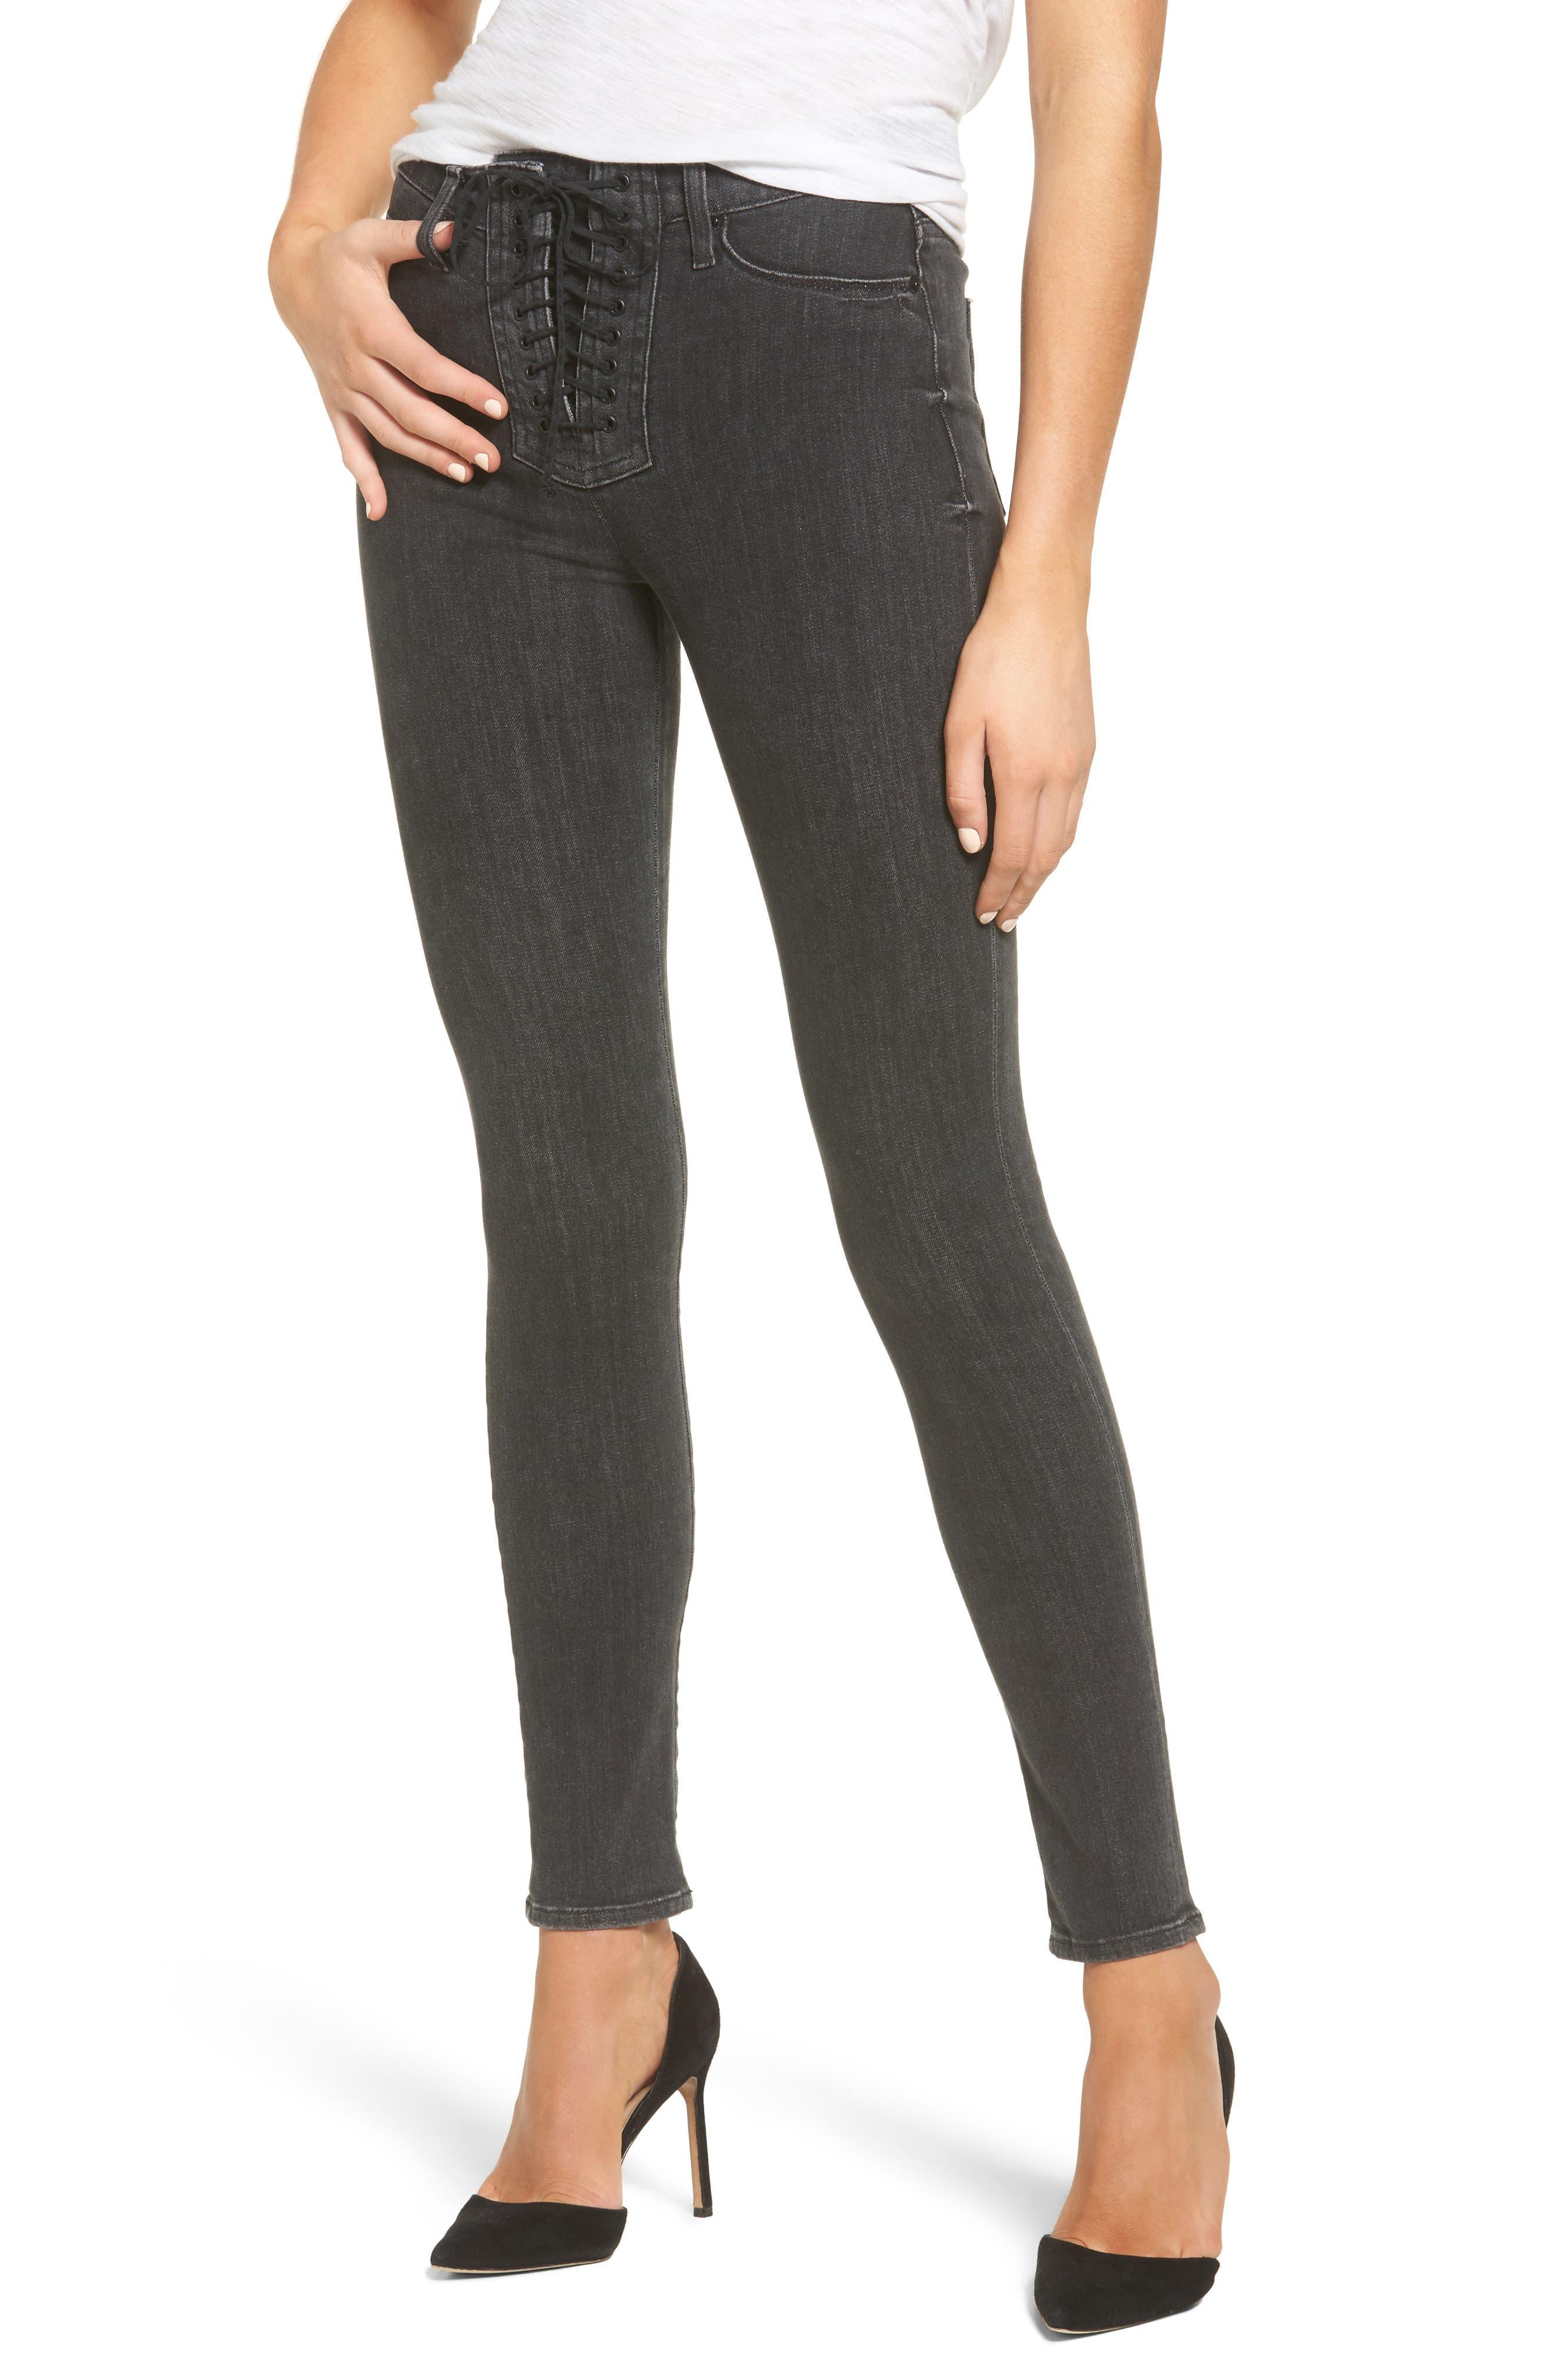 Bullocks High Waist Lace-Up Skinny Jeans,                             Main thumbnail 1, color,                             001